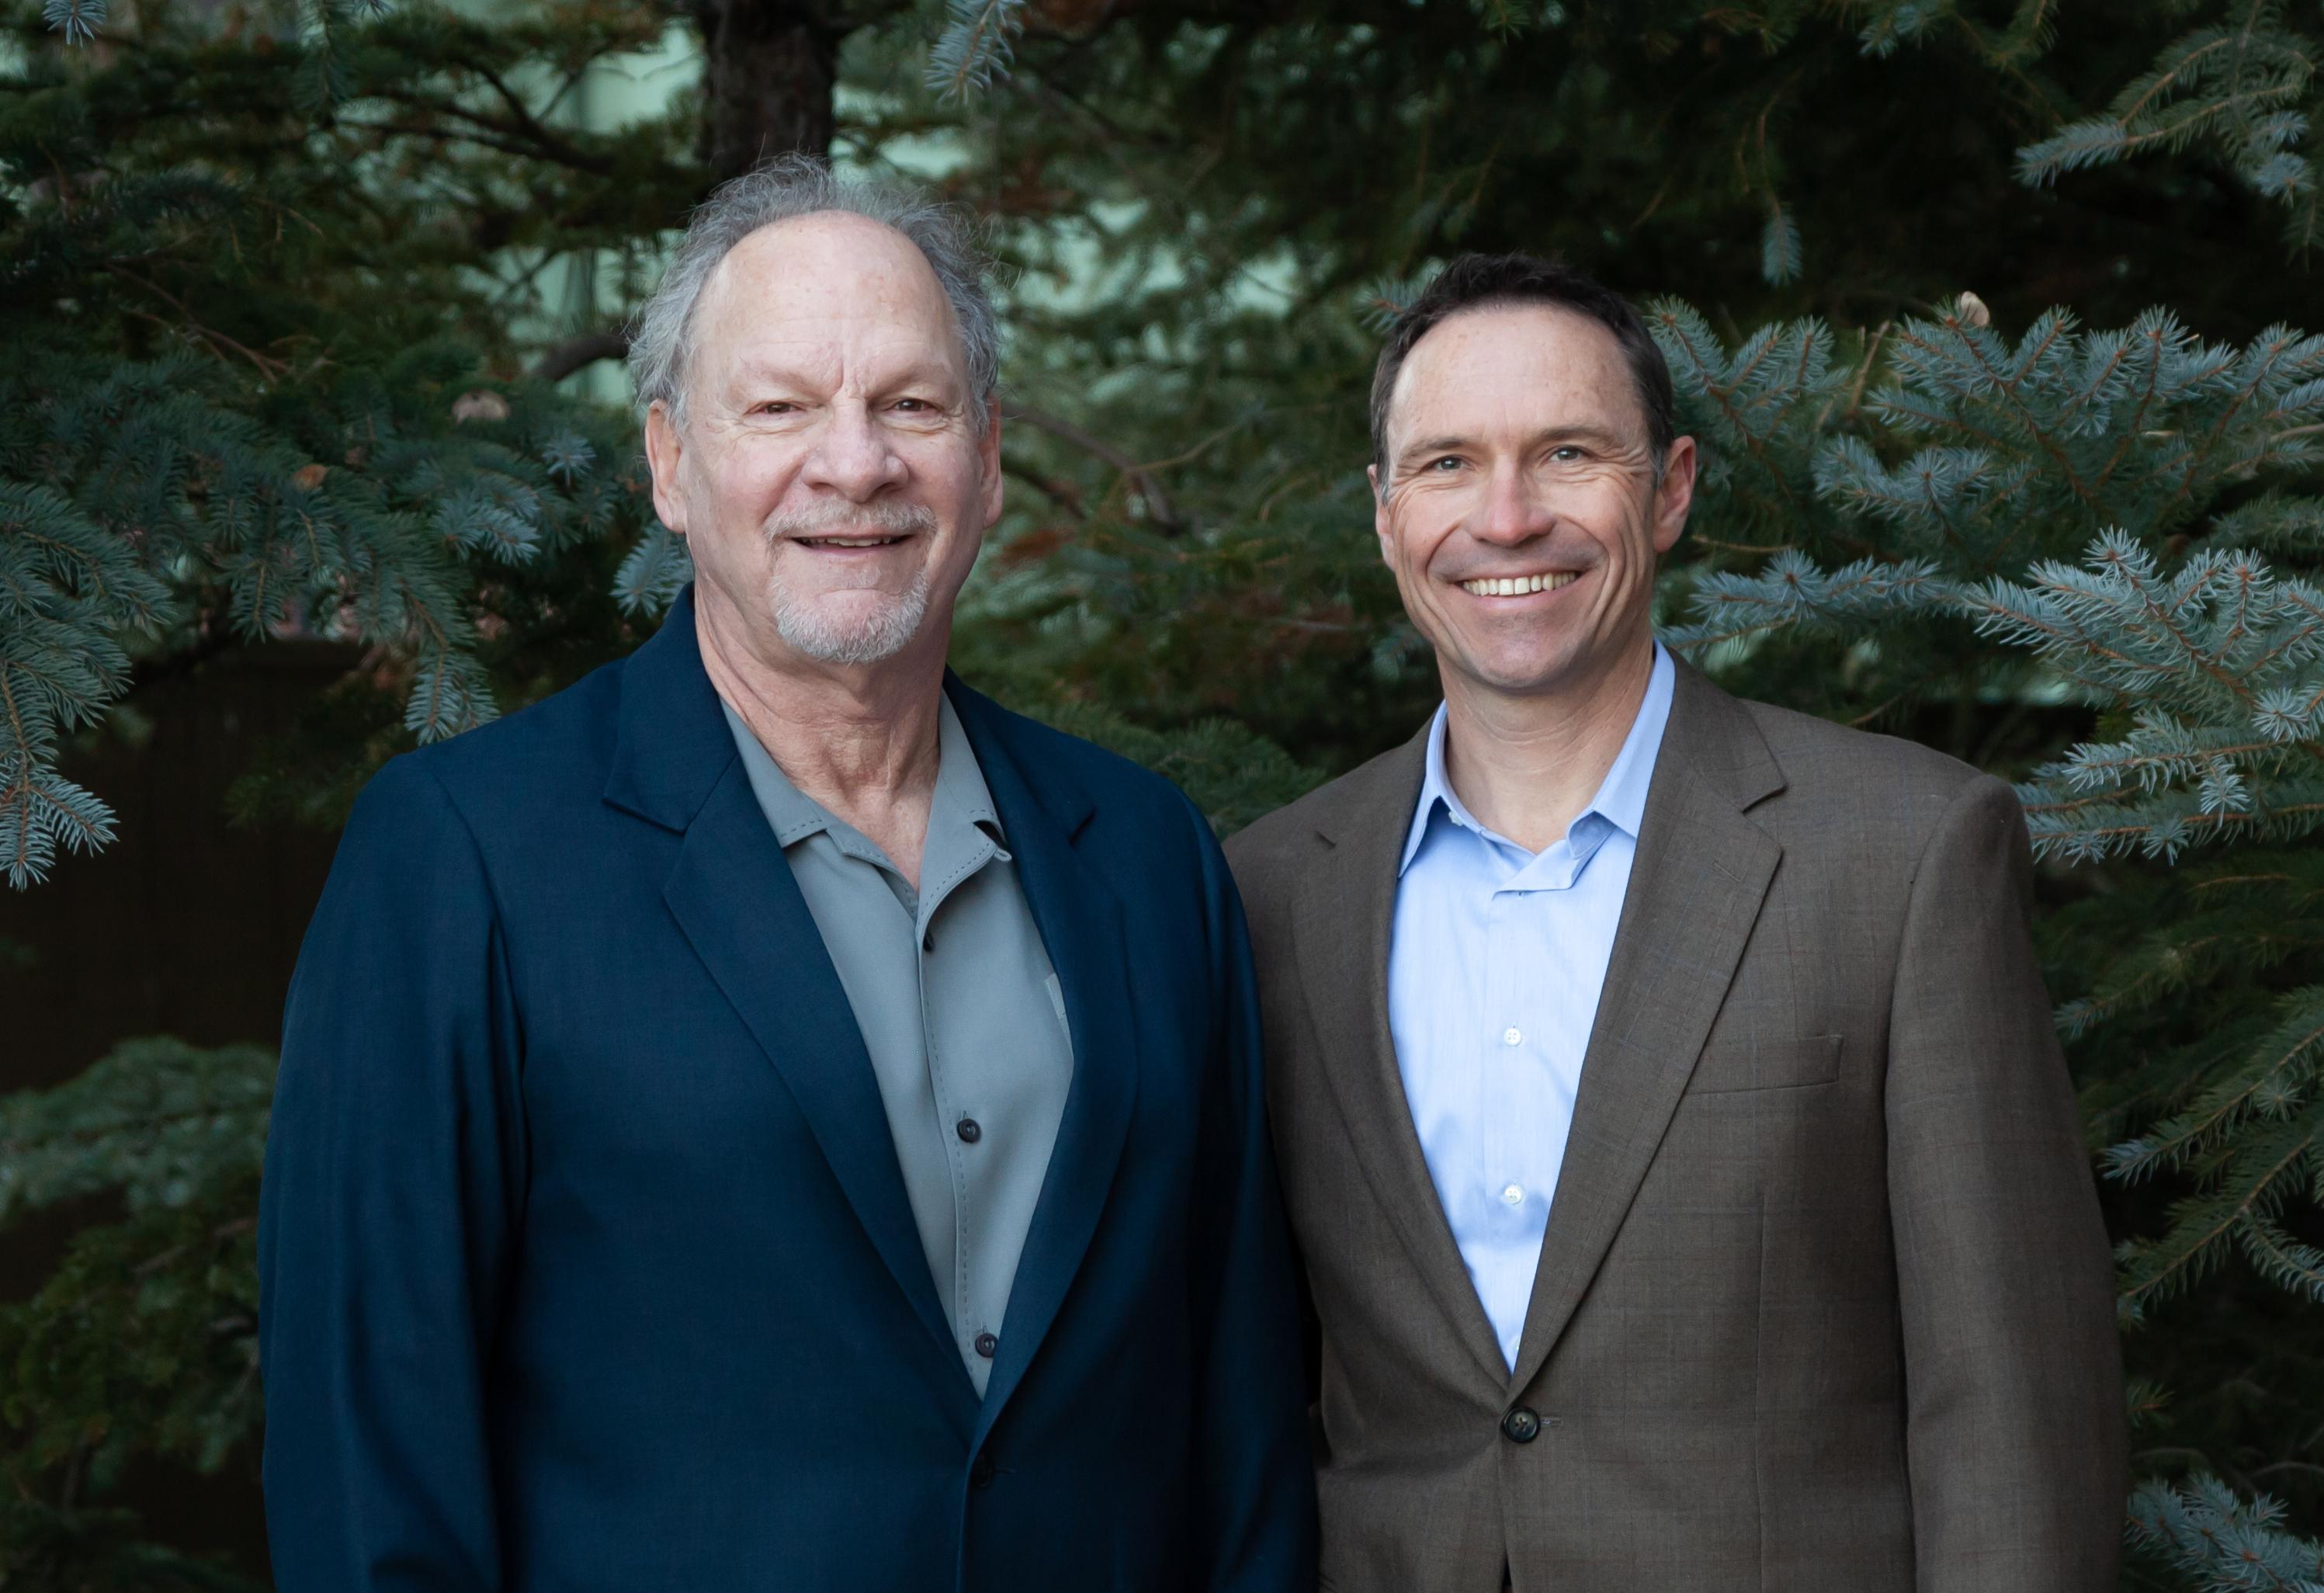 Ron Wilstein and Doug Almstedt